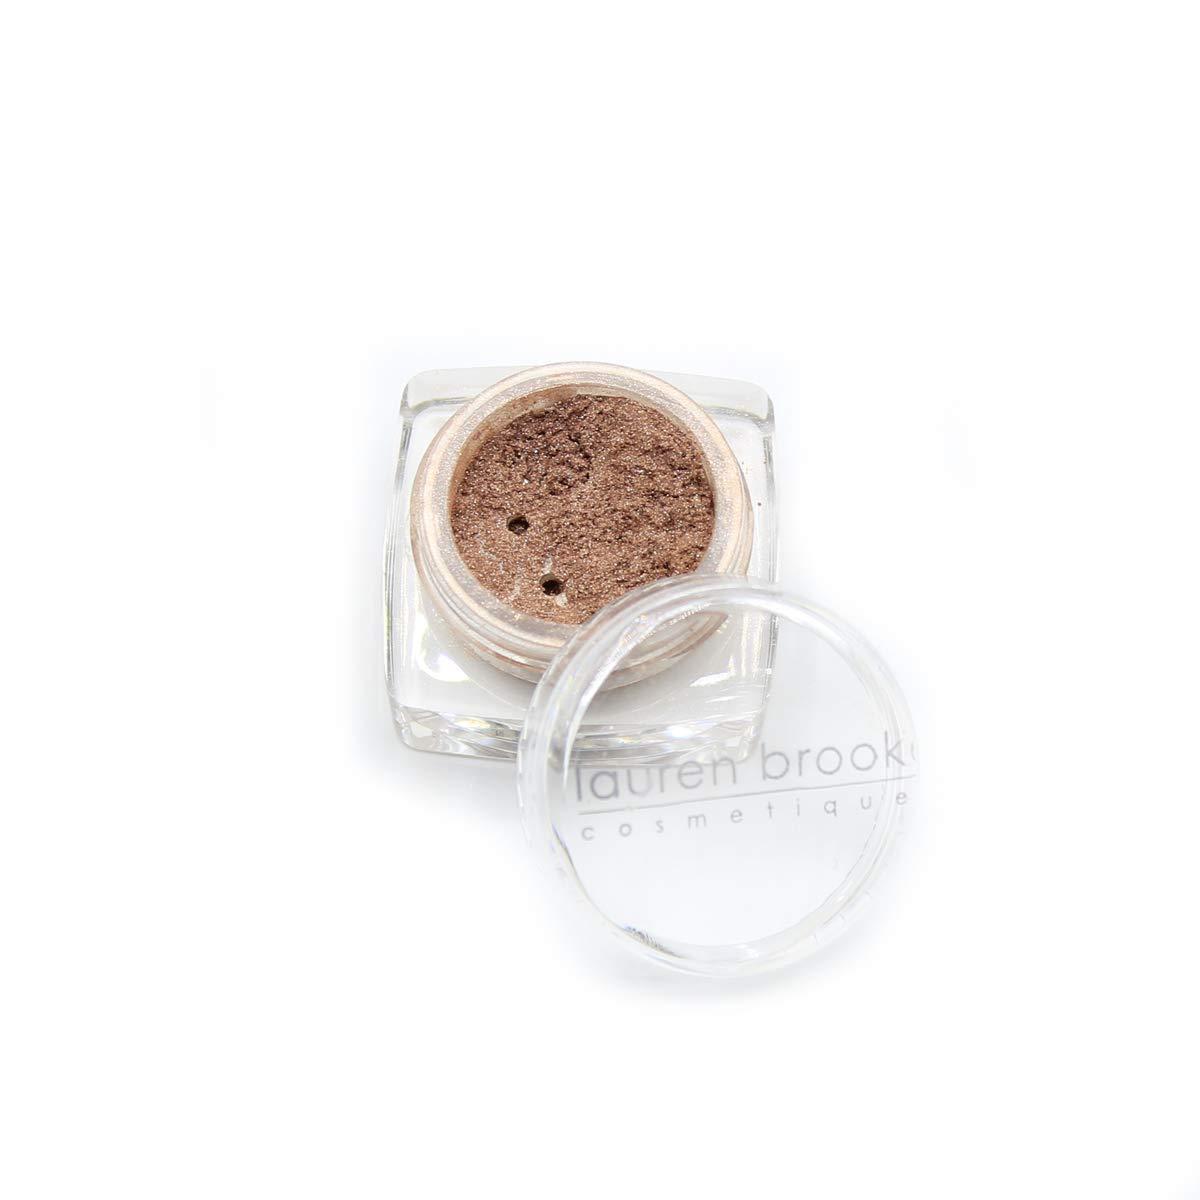 Lauren Brooke Cosmetiques Powder Eye Color, All Natural, Organic Eyeshadow Makeup (Cappuccino (Shimmer))